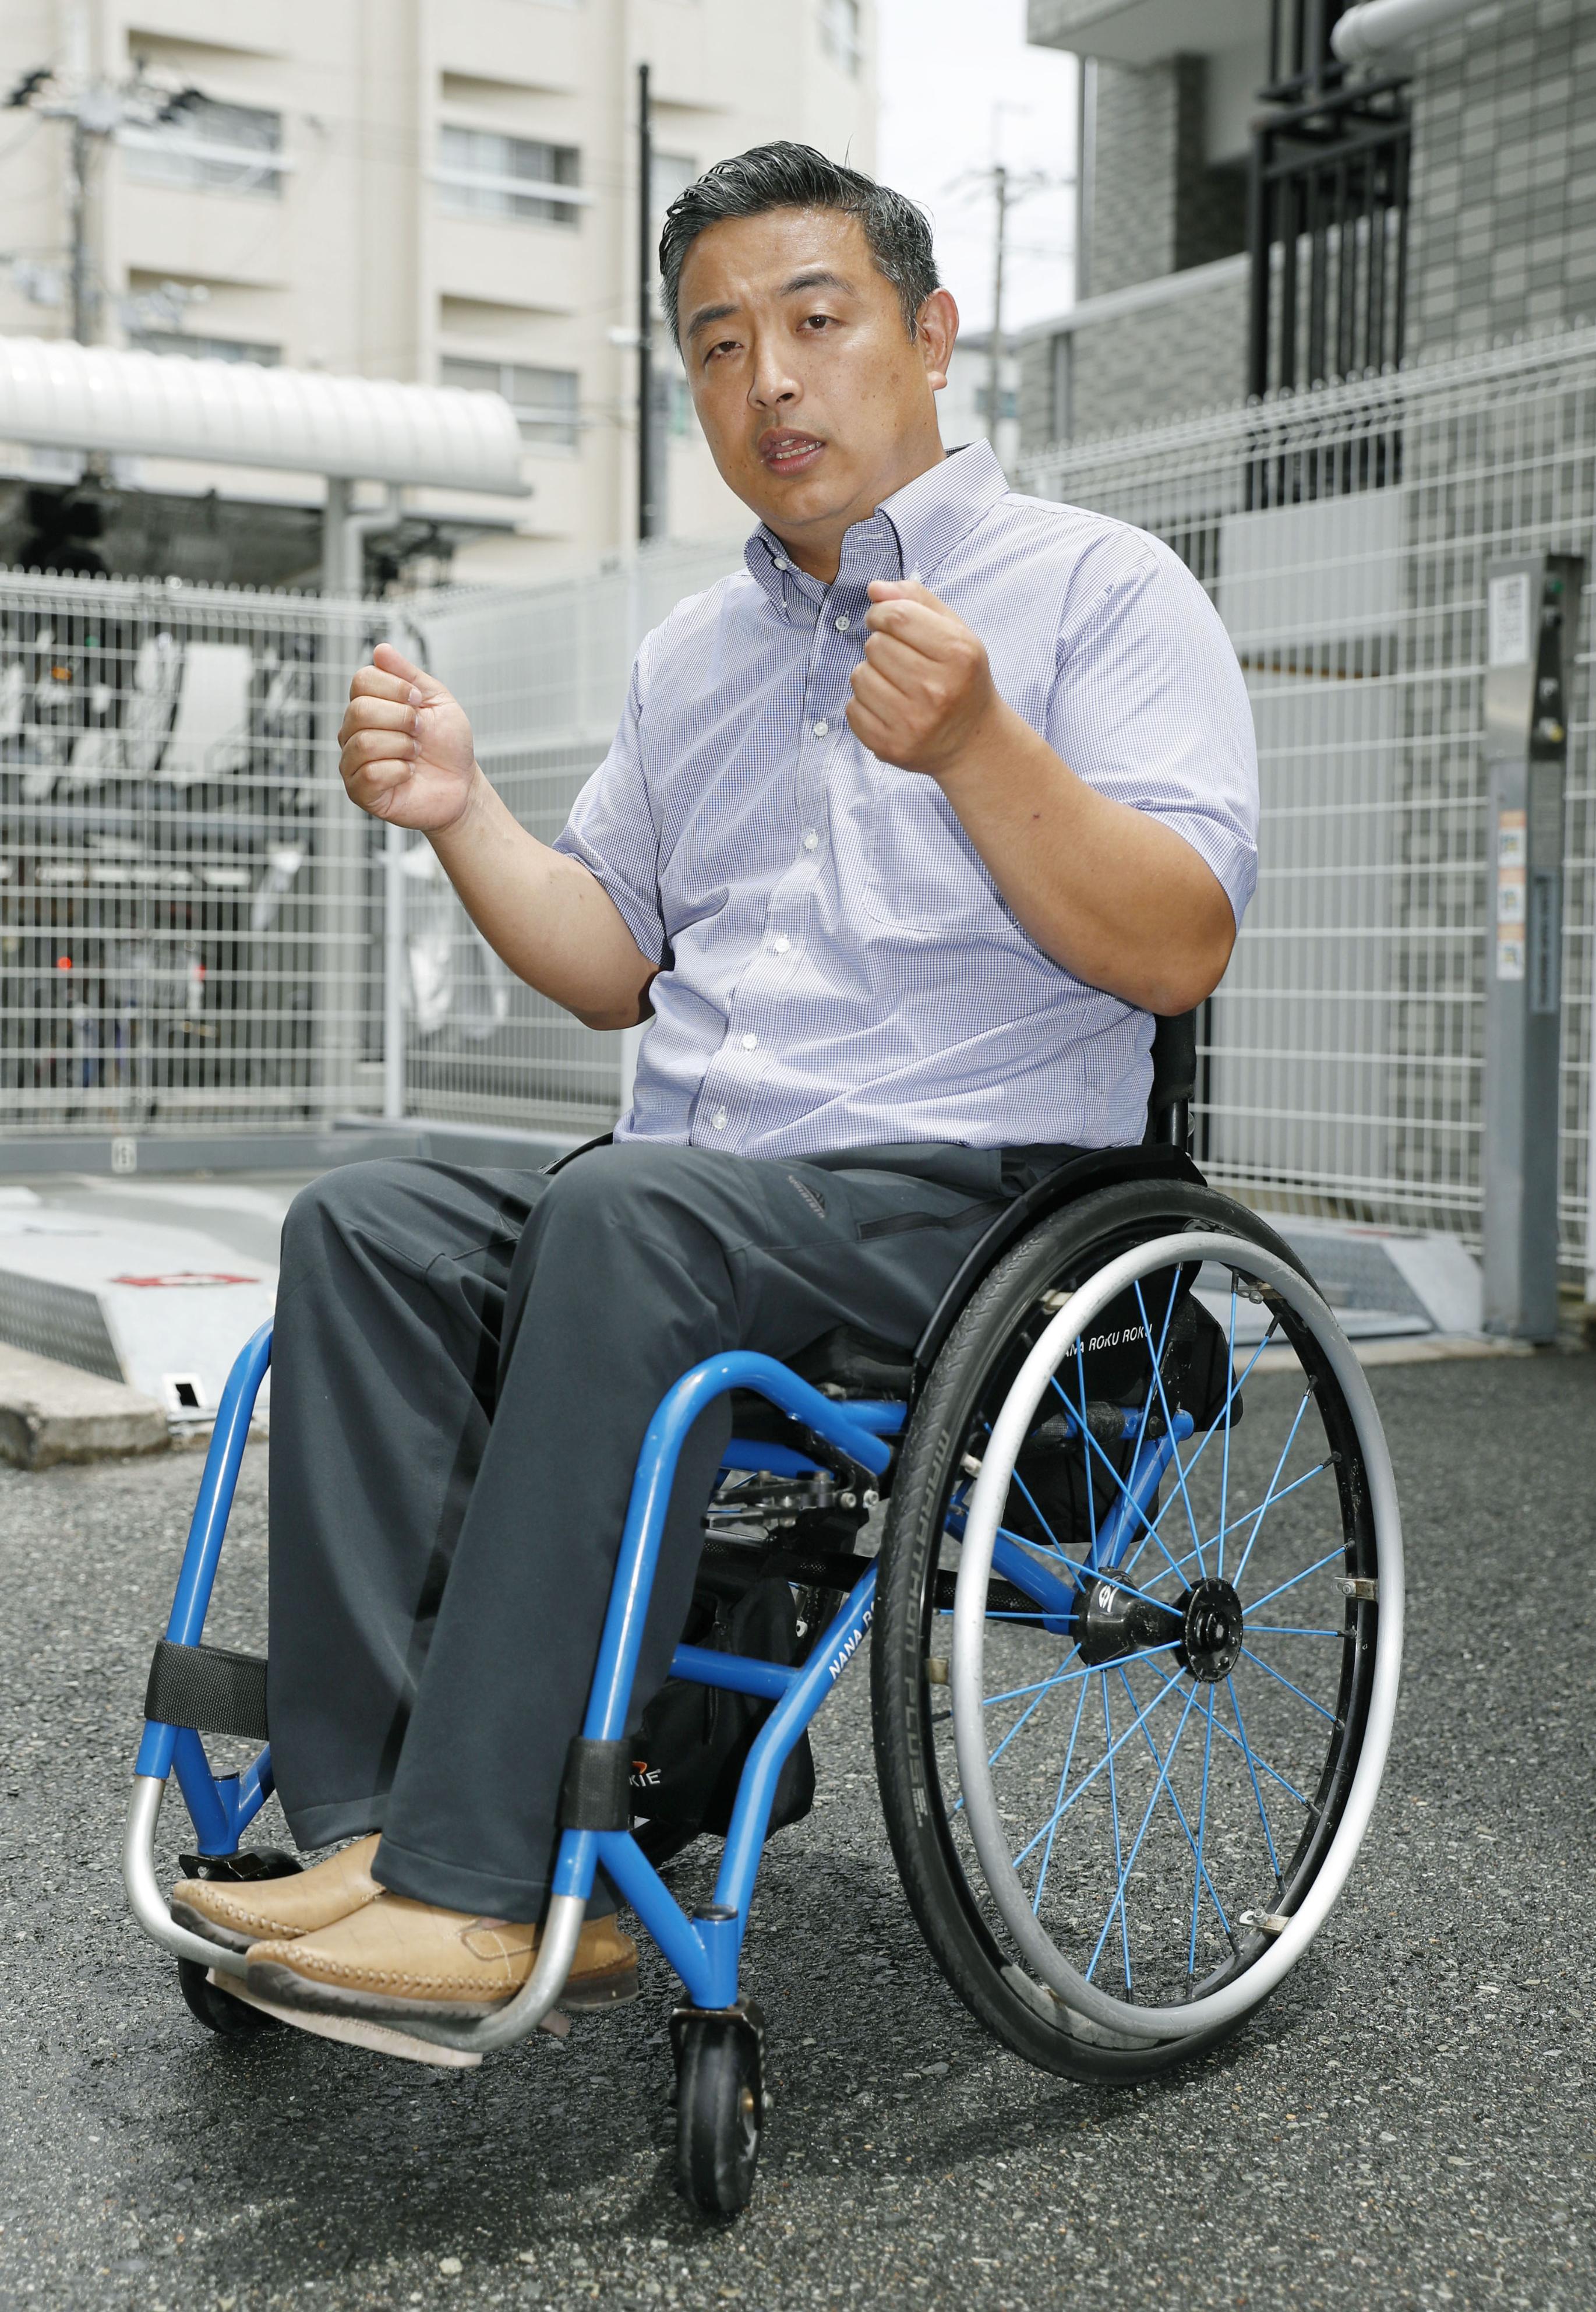 hideto-kijima-discapacitado-japon.jpg